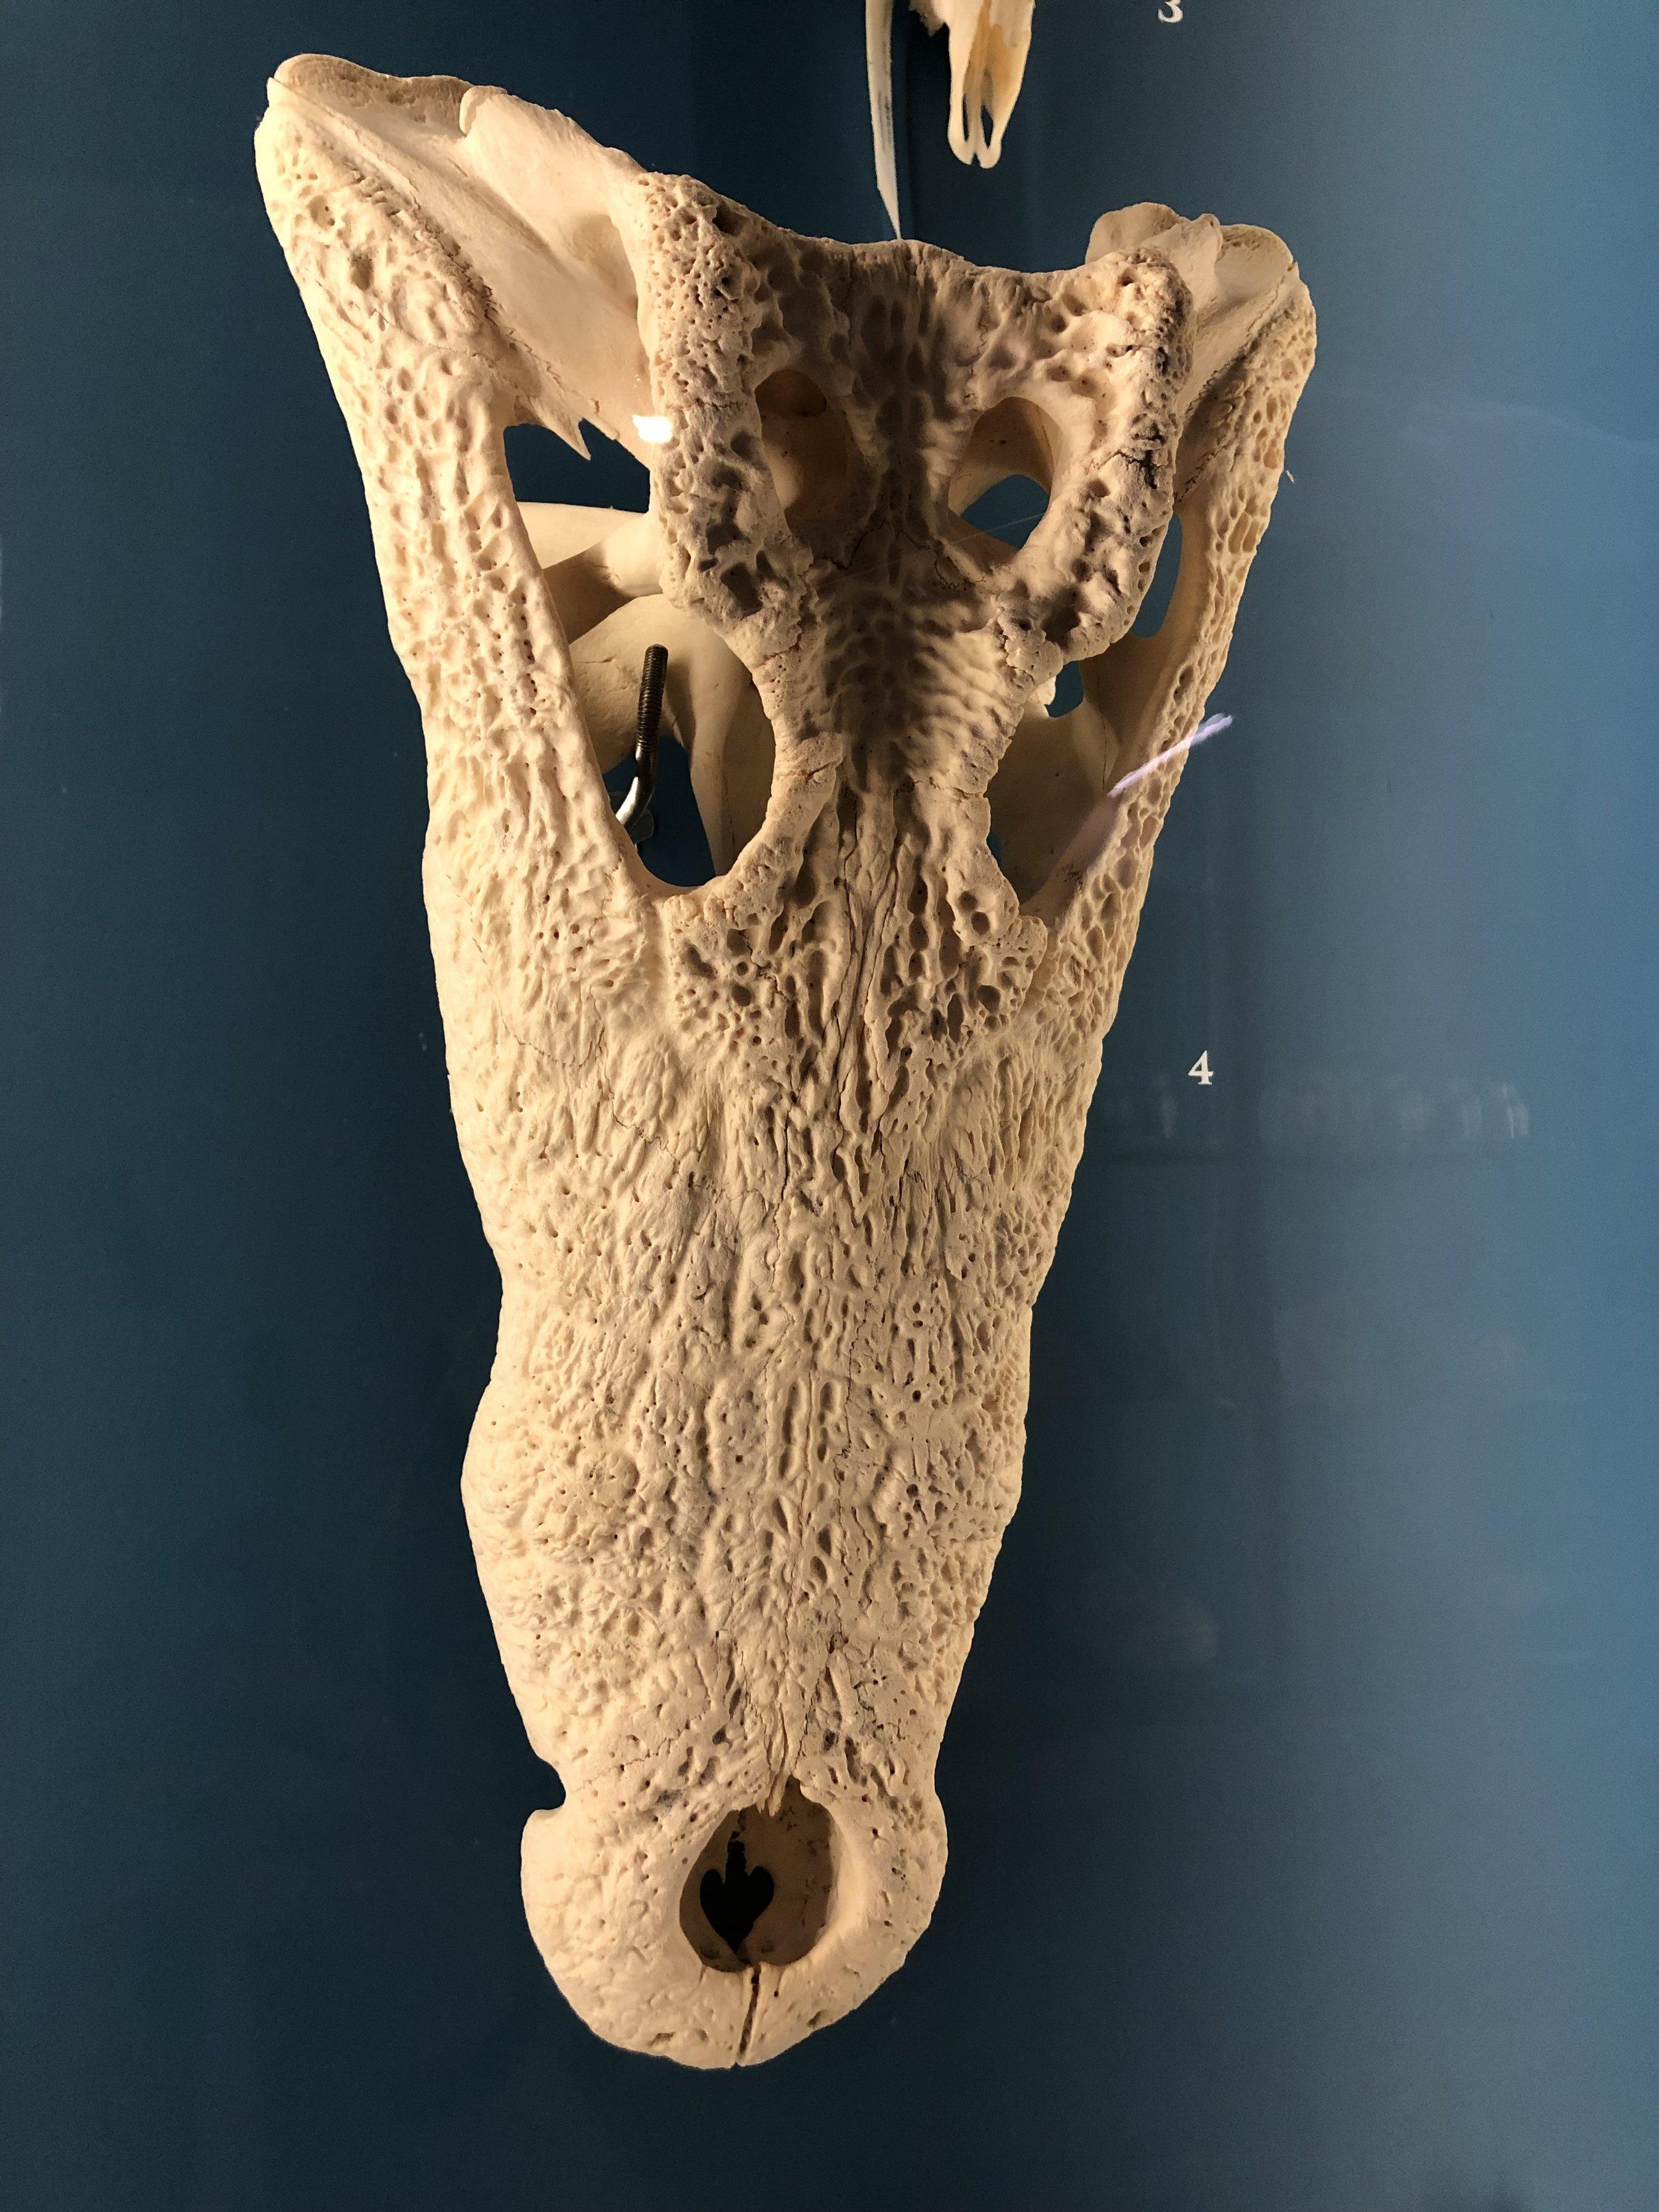 Nile Crocodile skull  (Crocodylus niloticus ) | Credit: Talita Bateman